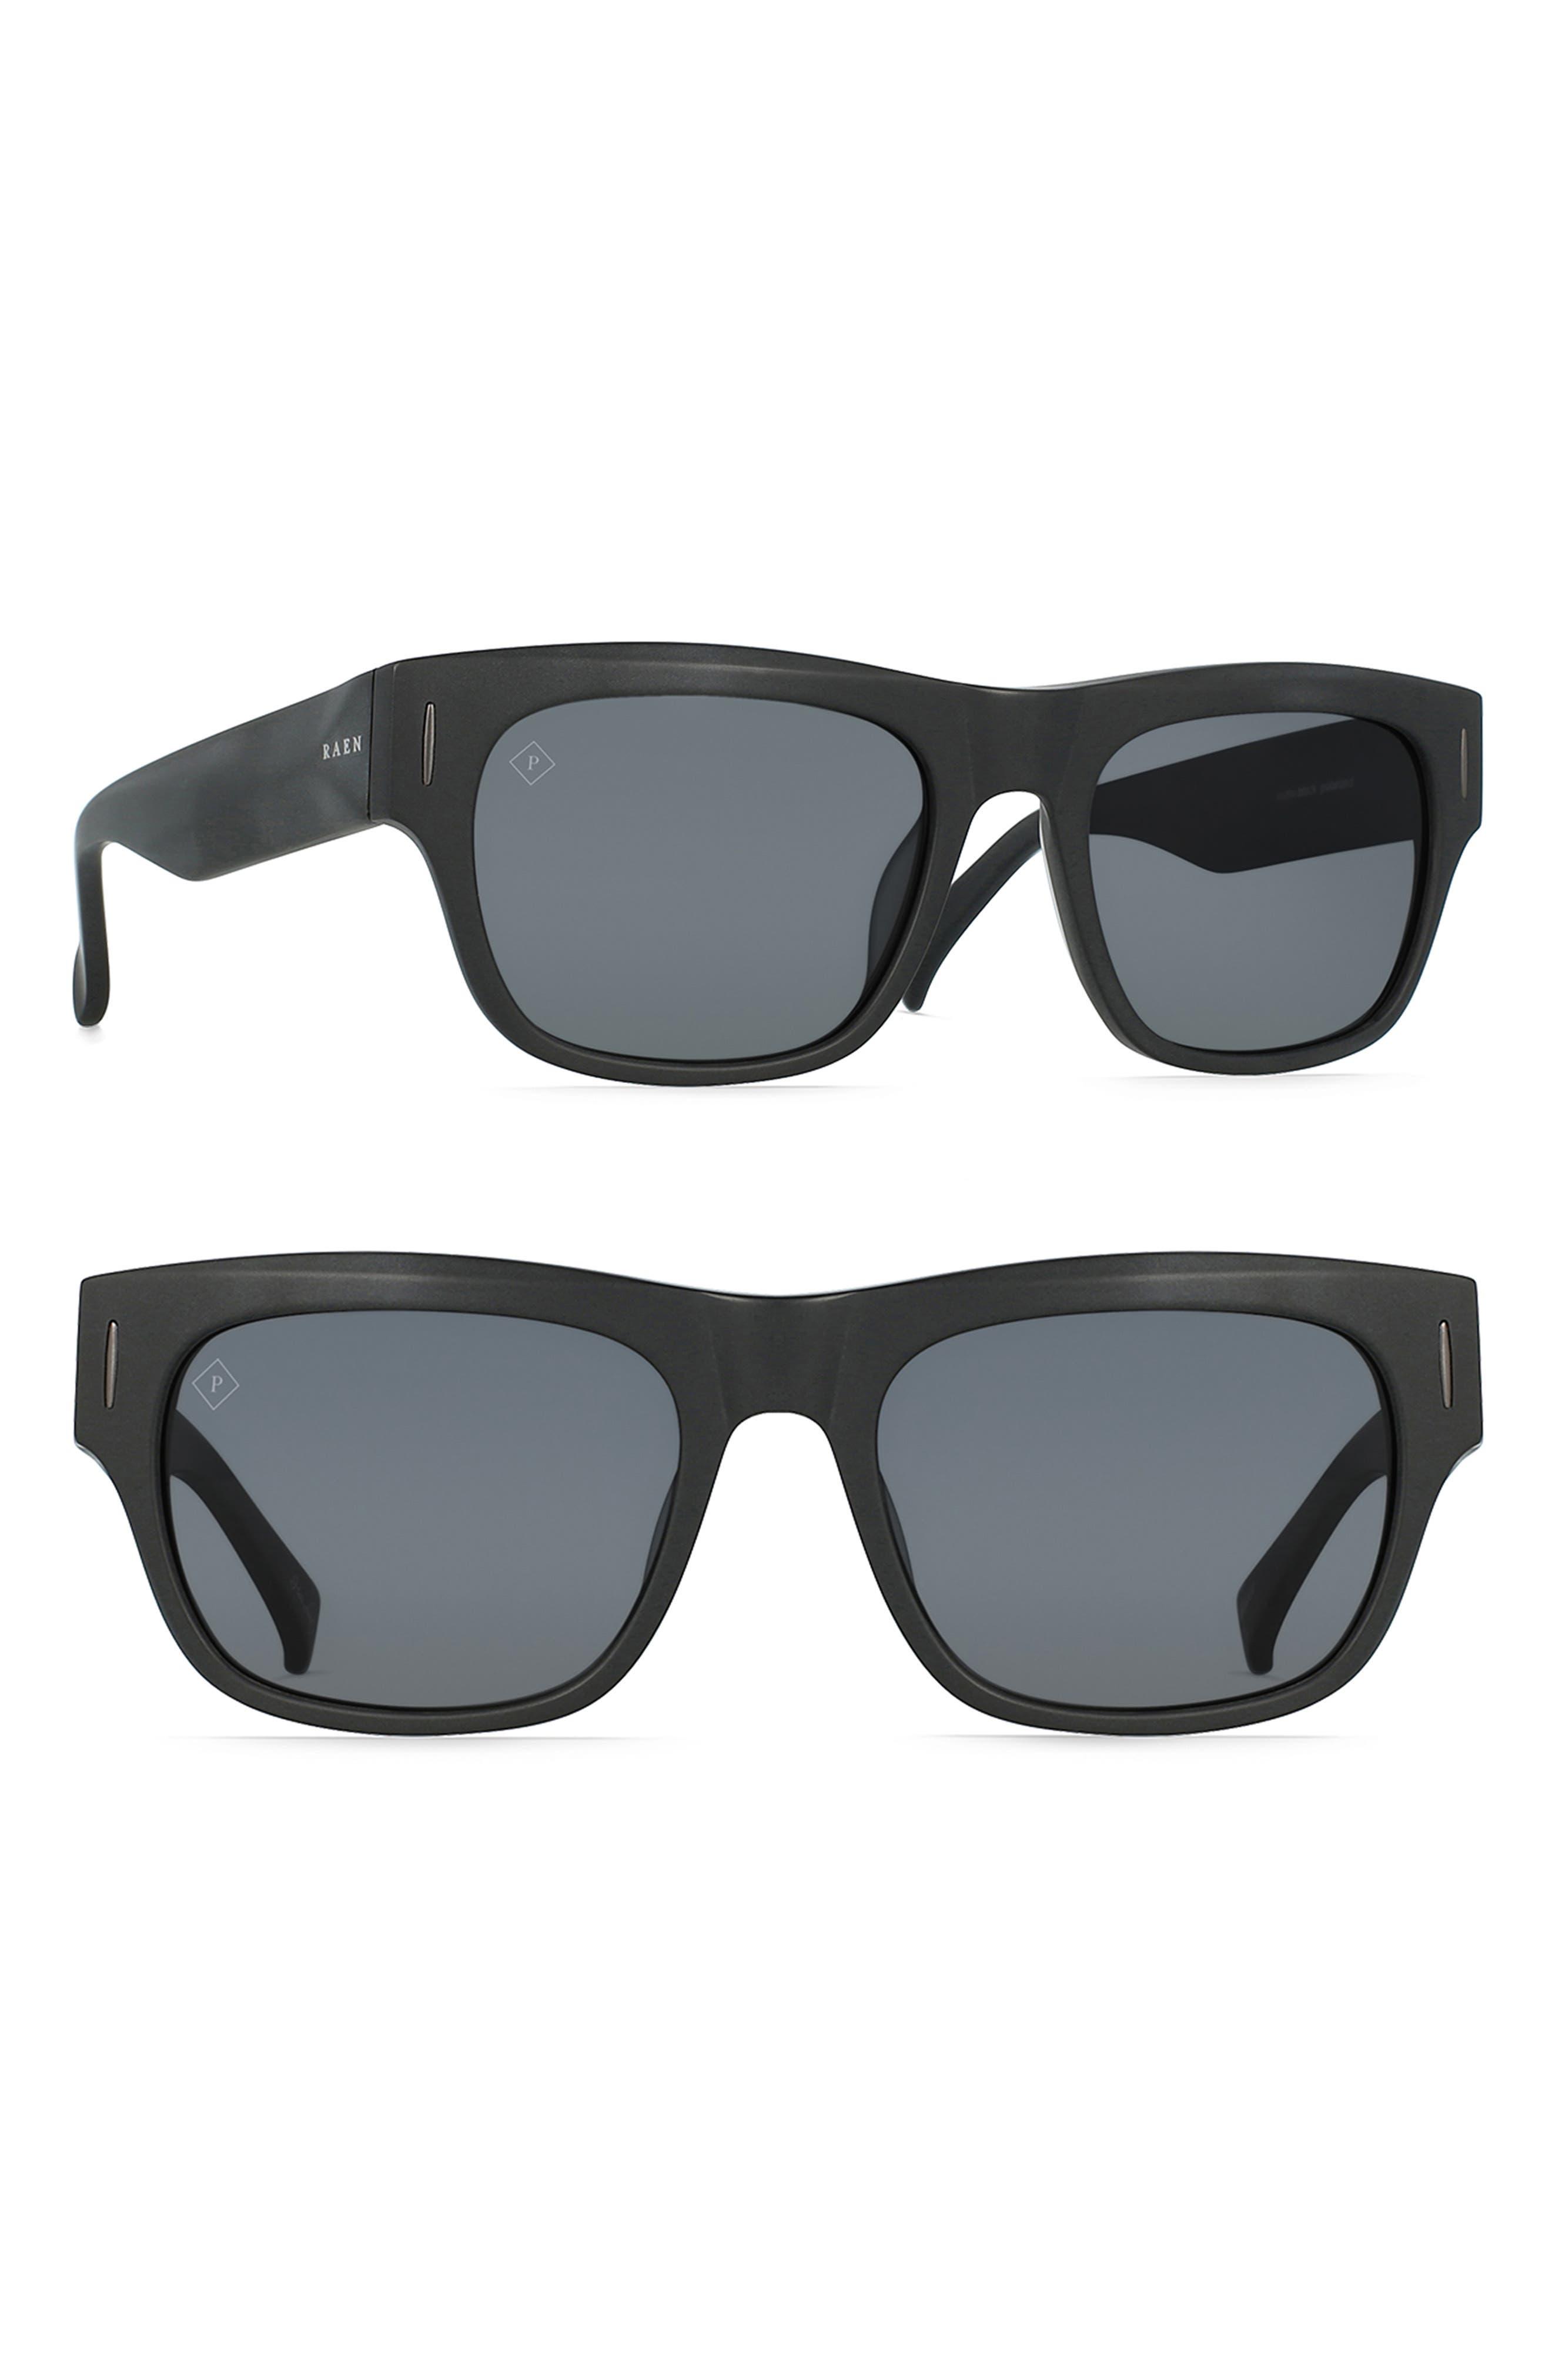 RAEN Lenny 55Mm Polarized Sunglasses - Matte Black/ Black